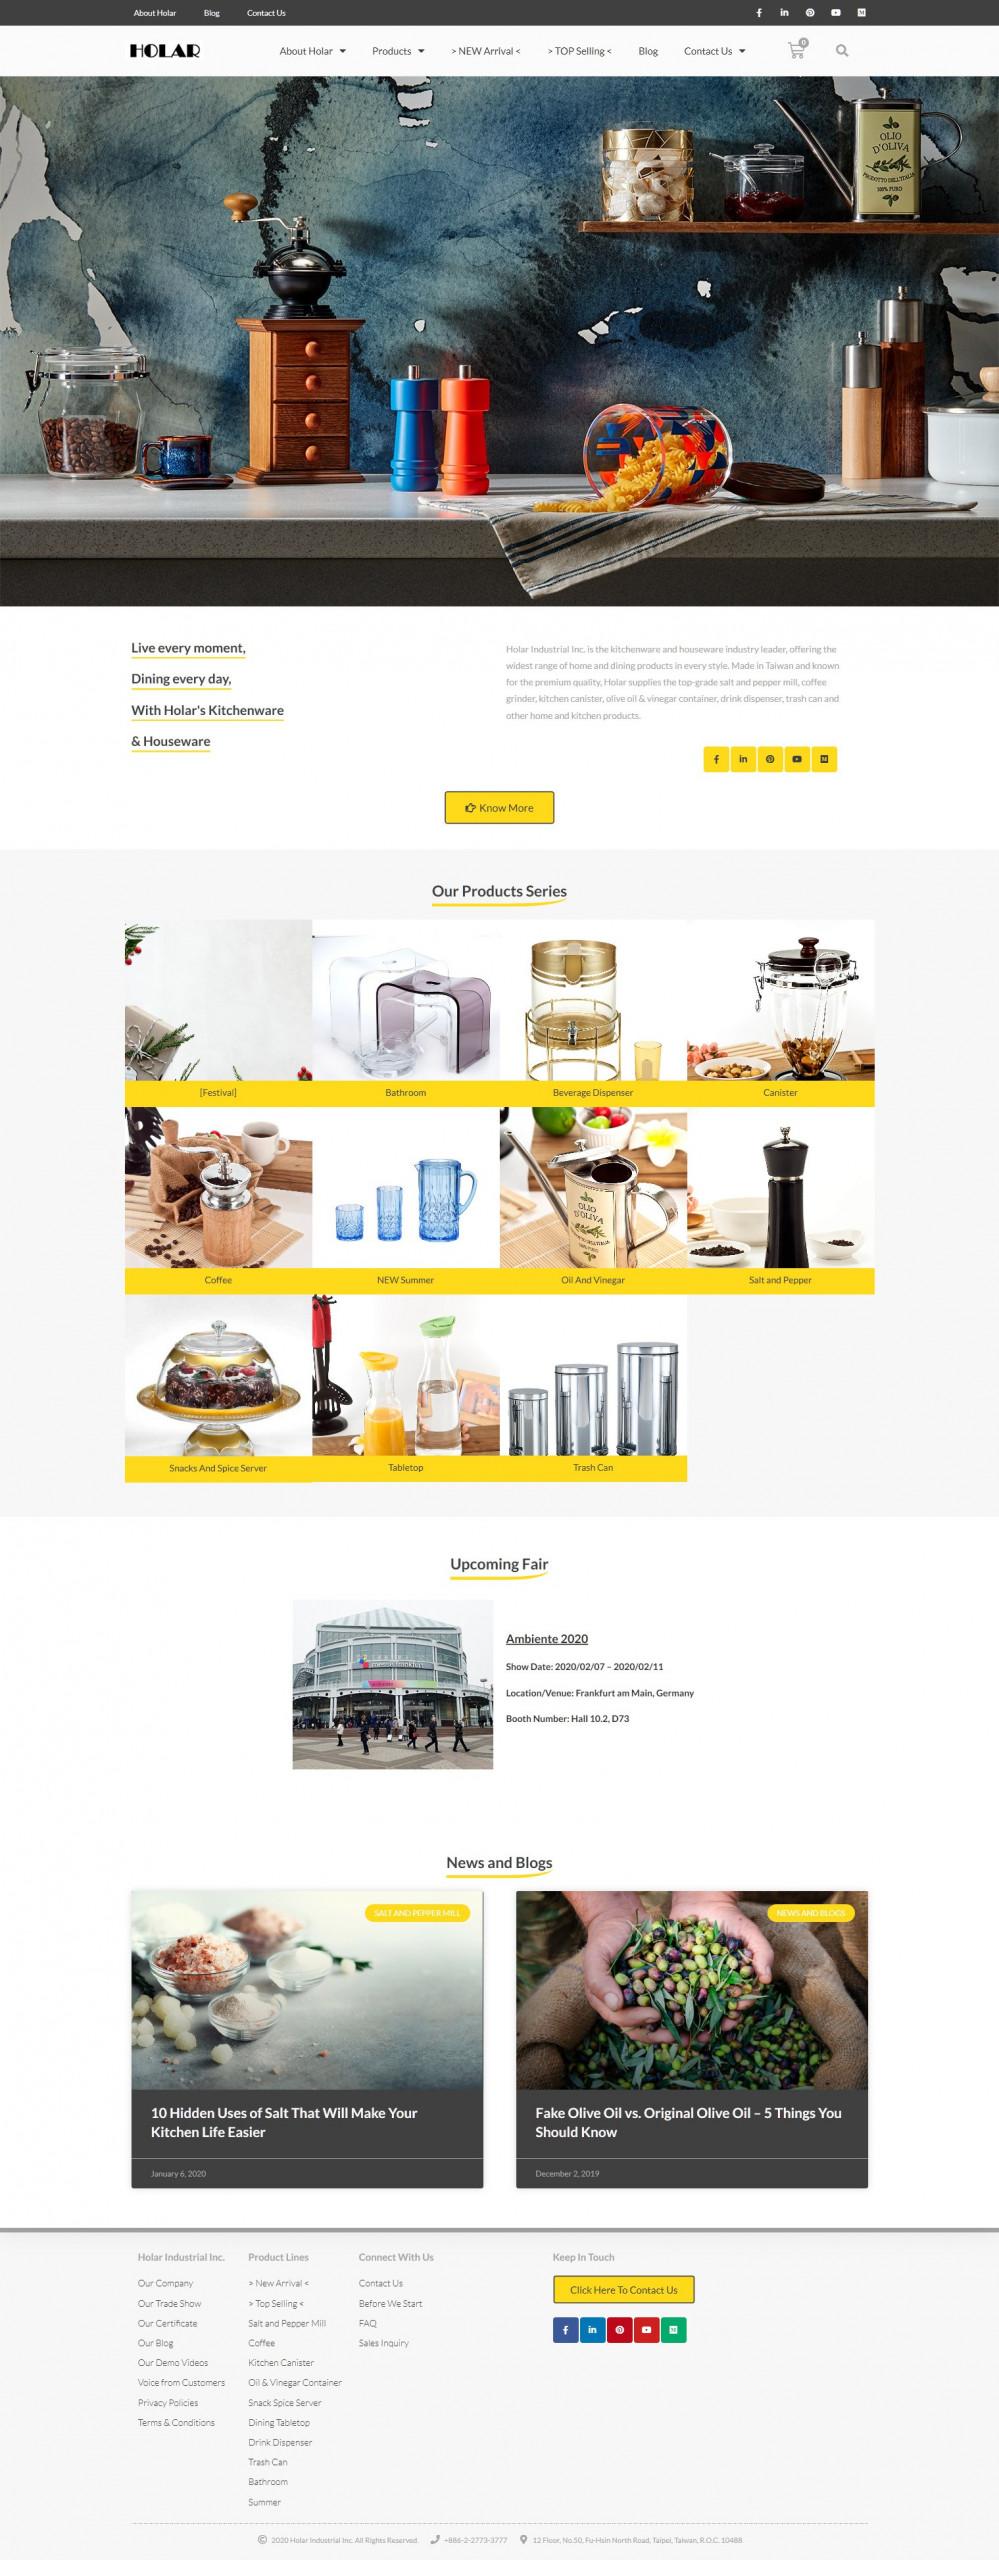 Home(Full) - Holar Taiwan Kitchenware Houseware Expert Supplier